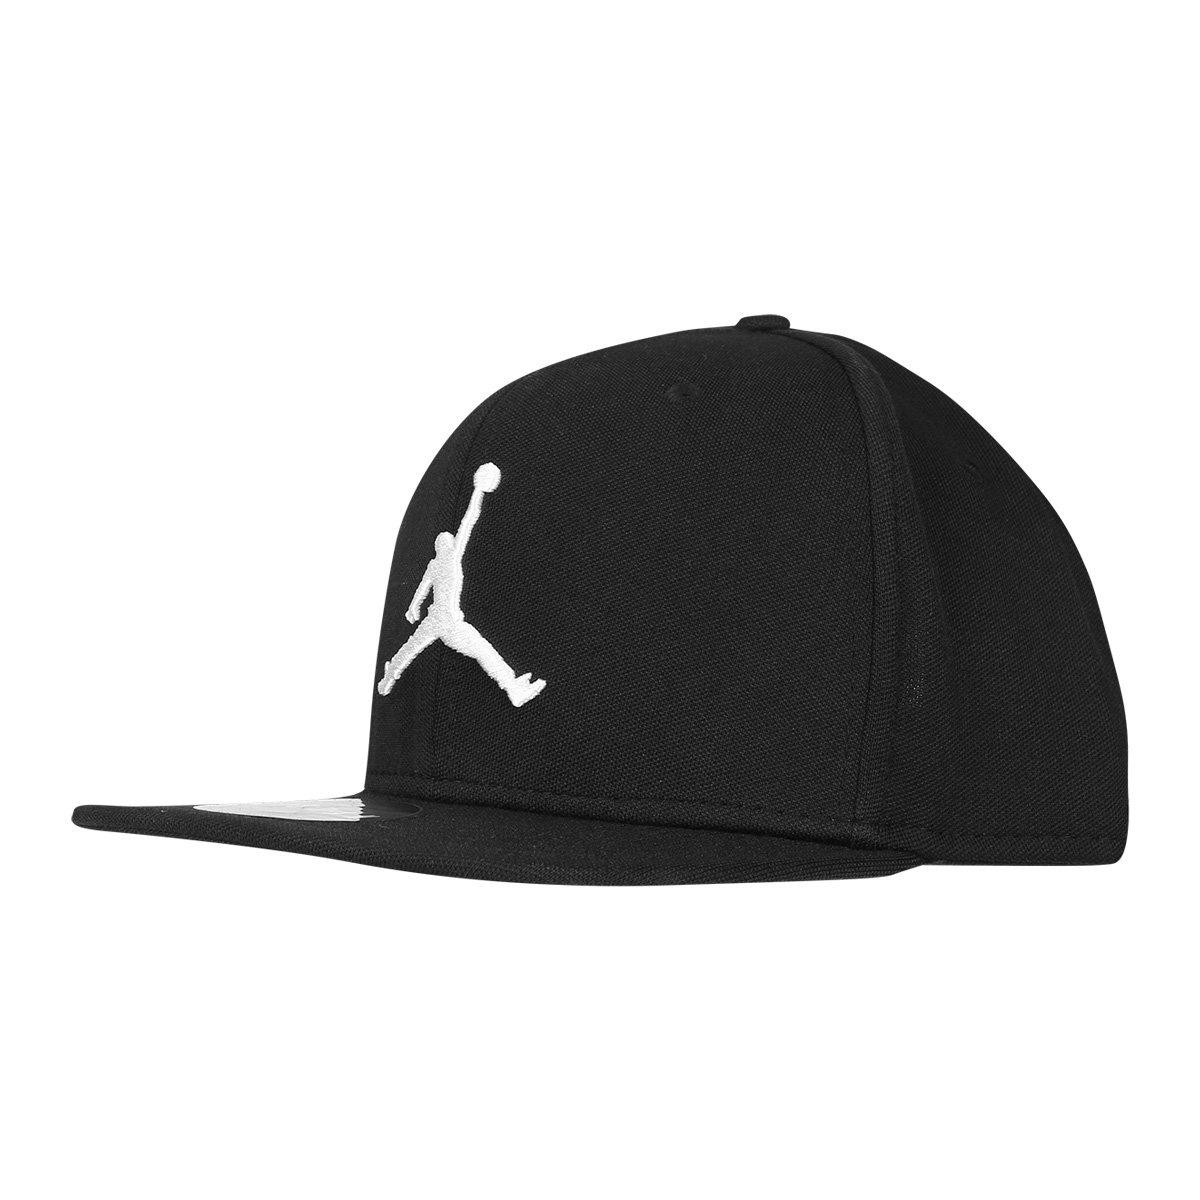 Boné Nike NBA Aba Reta Jumpman Jordan - Compre Agora  56fbd23ac50